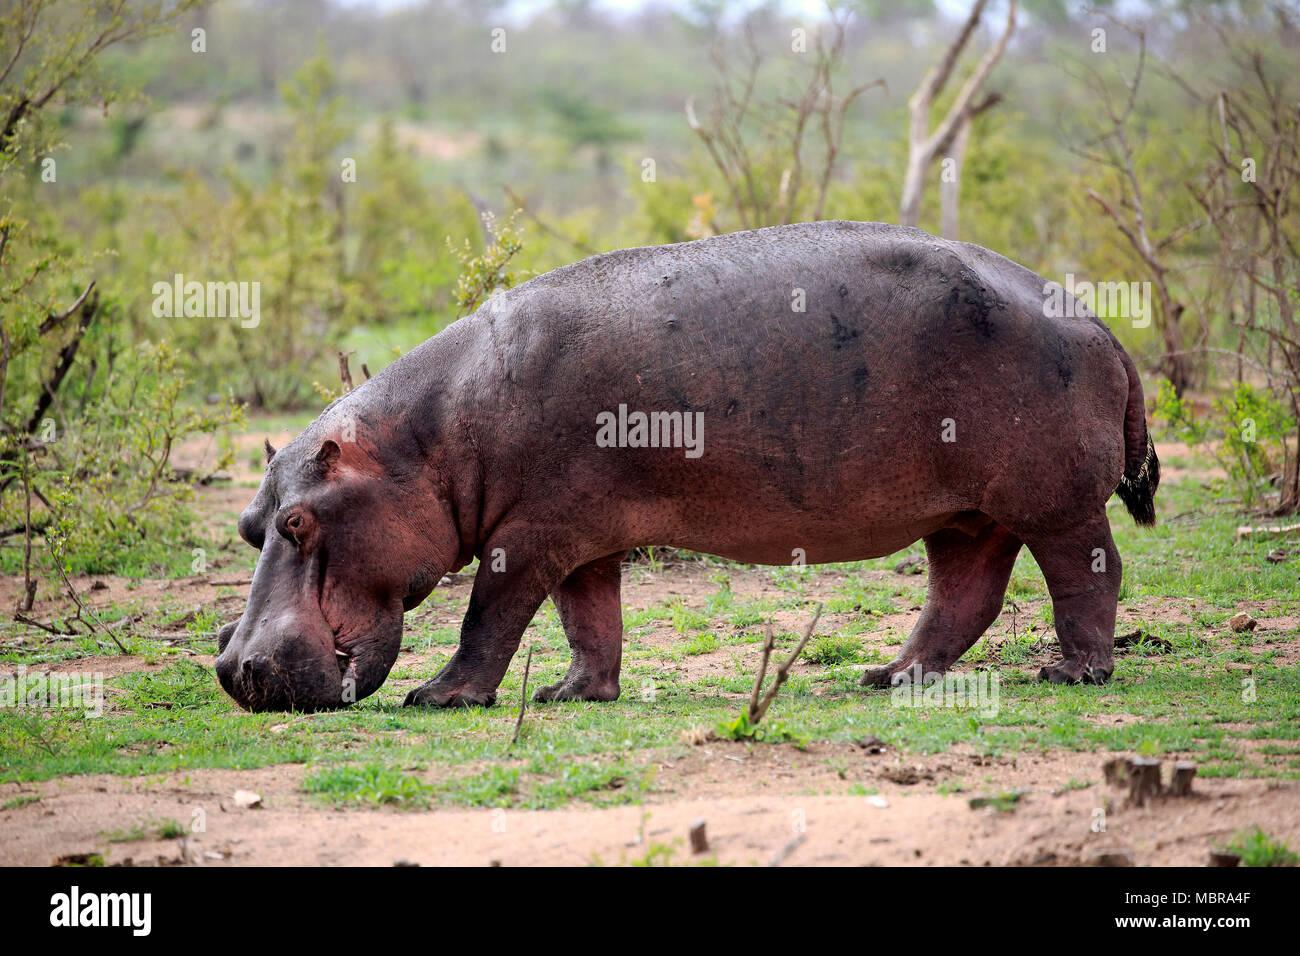 Hippo (Hippopotamus amphibius), adult, eats fresh grass, foraging, Sabi Sand Game Reserve, Kruger National Park, South Africa - Stock Image